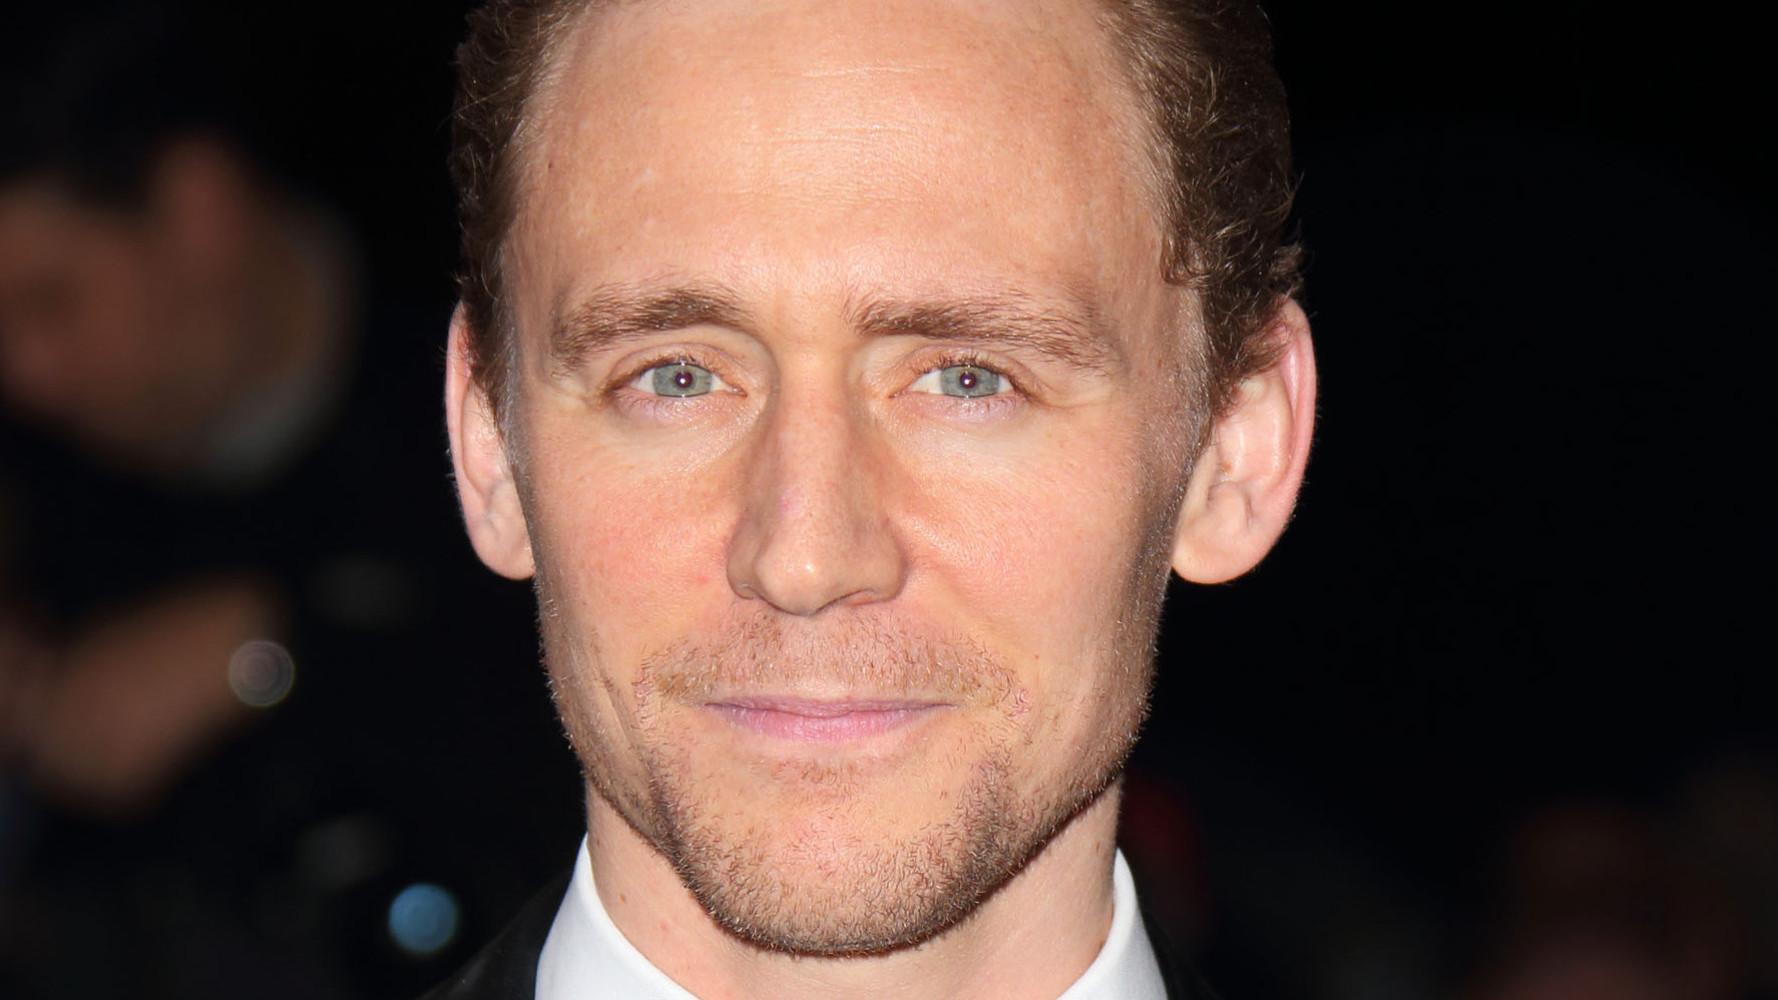 Tom Hiddleston gecast als Hank Williams in biopic 'I Saw the Light'